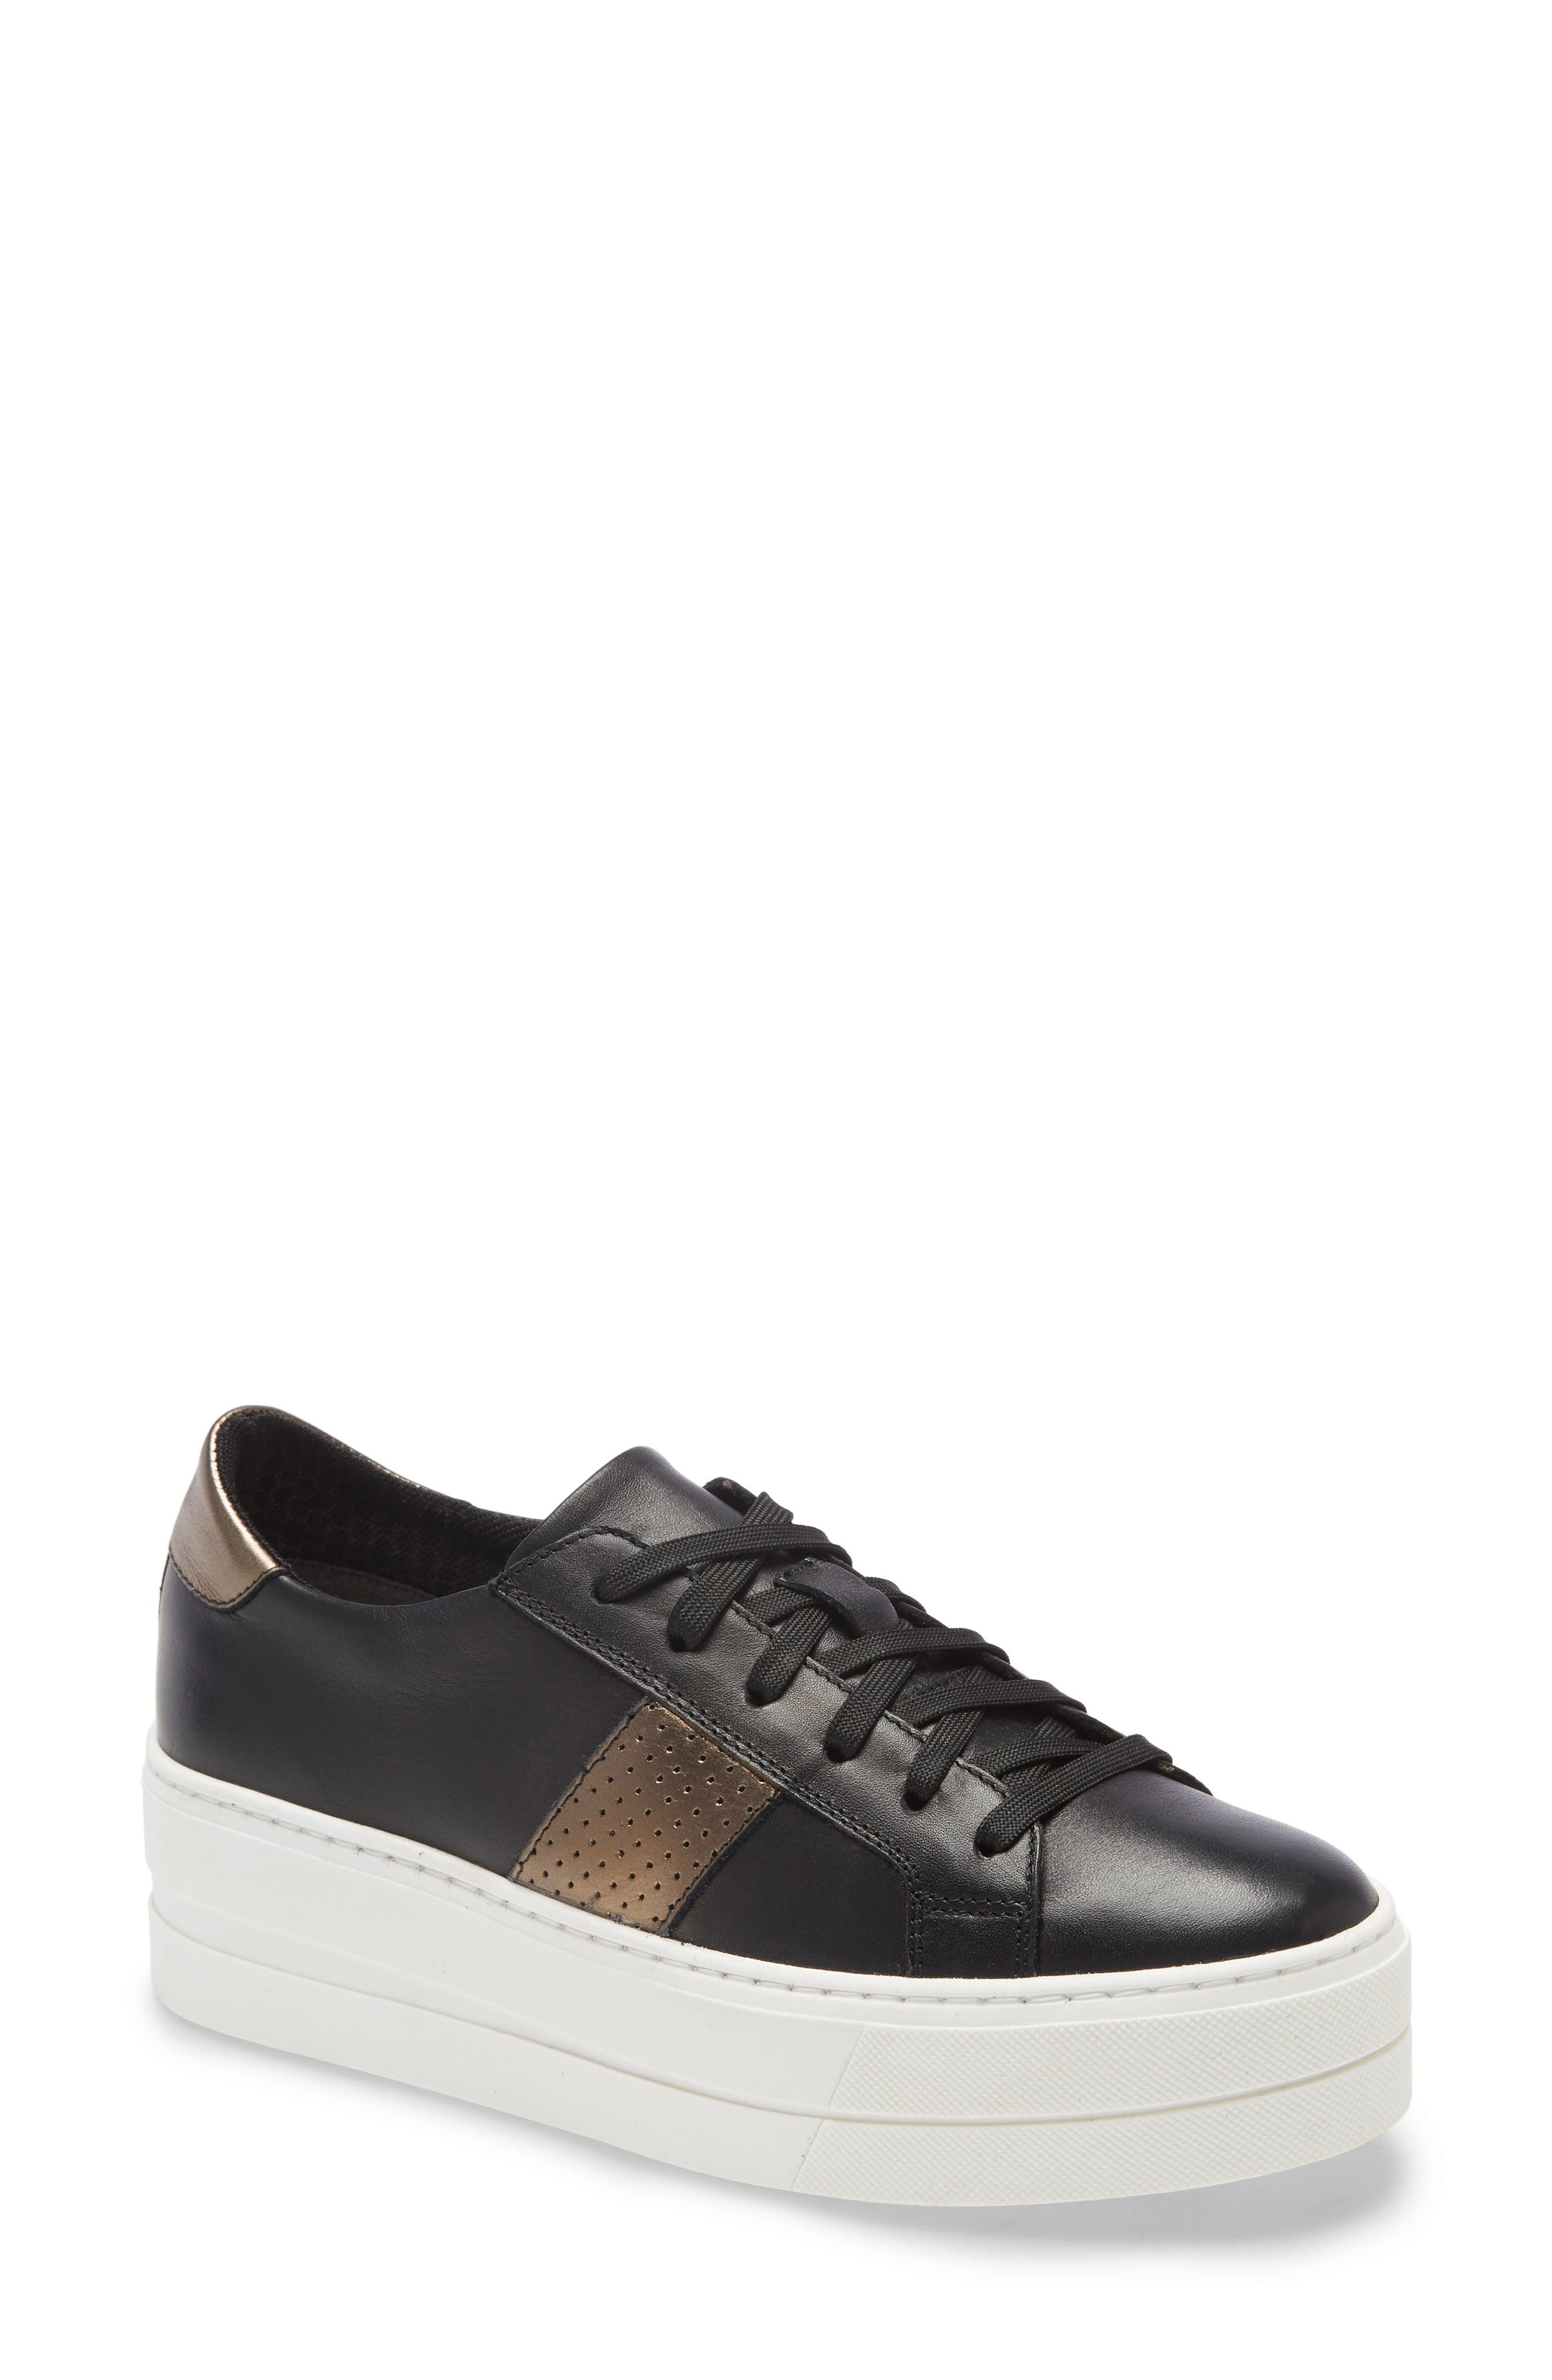 Maison Platform Sneaker